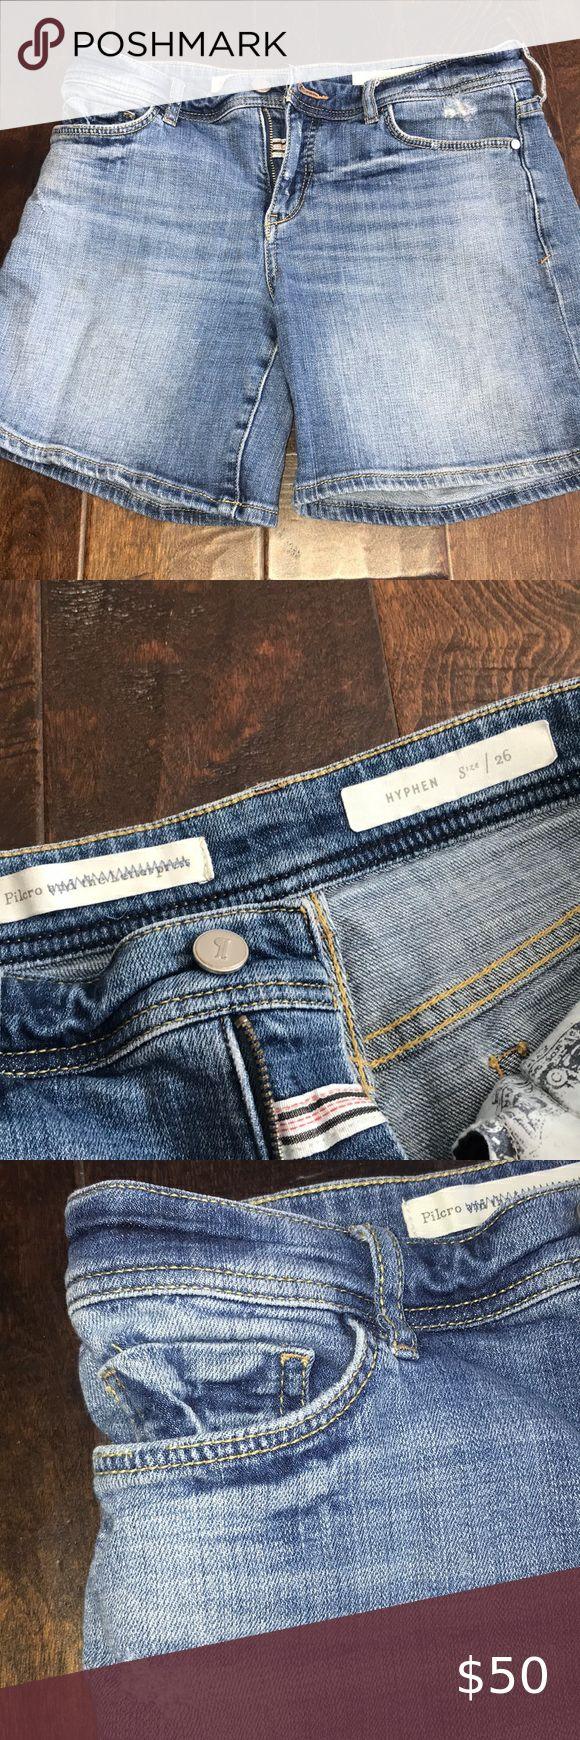 H&M Button down   Fashion, Clothes design, Fashion trends